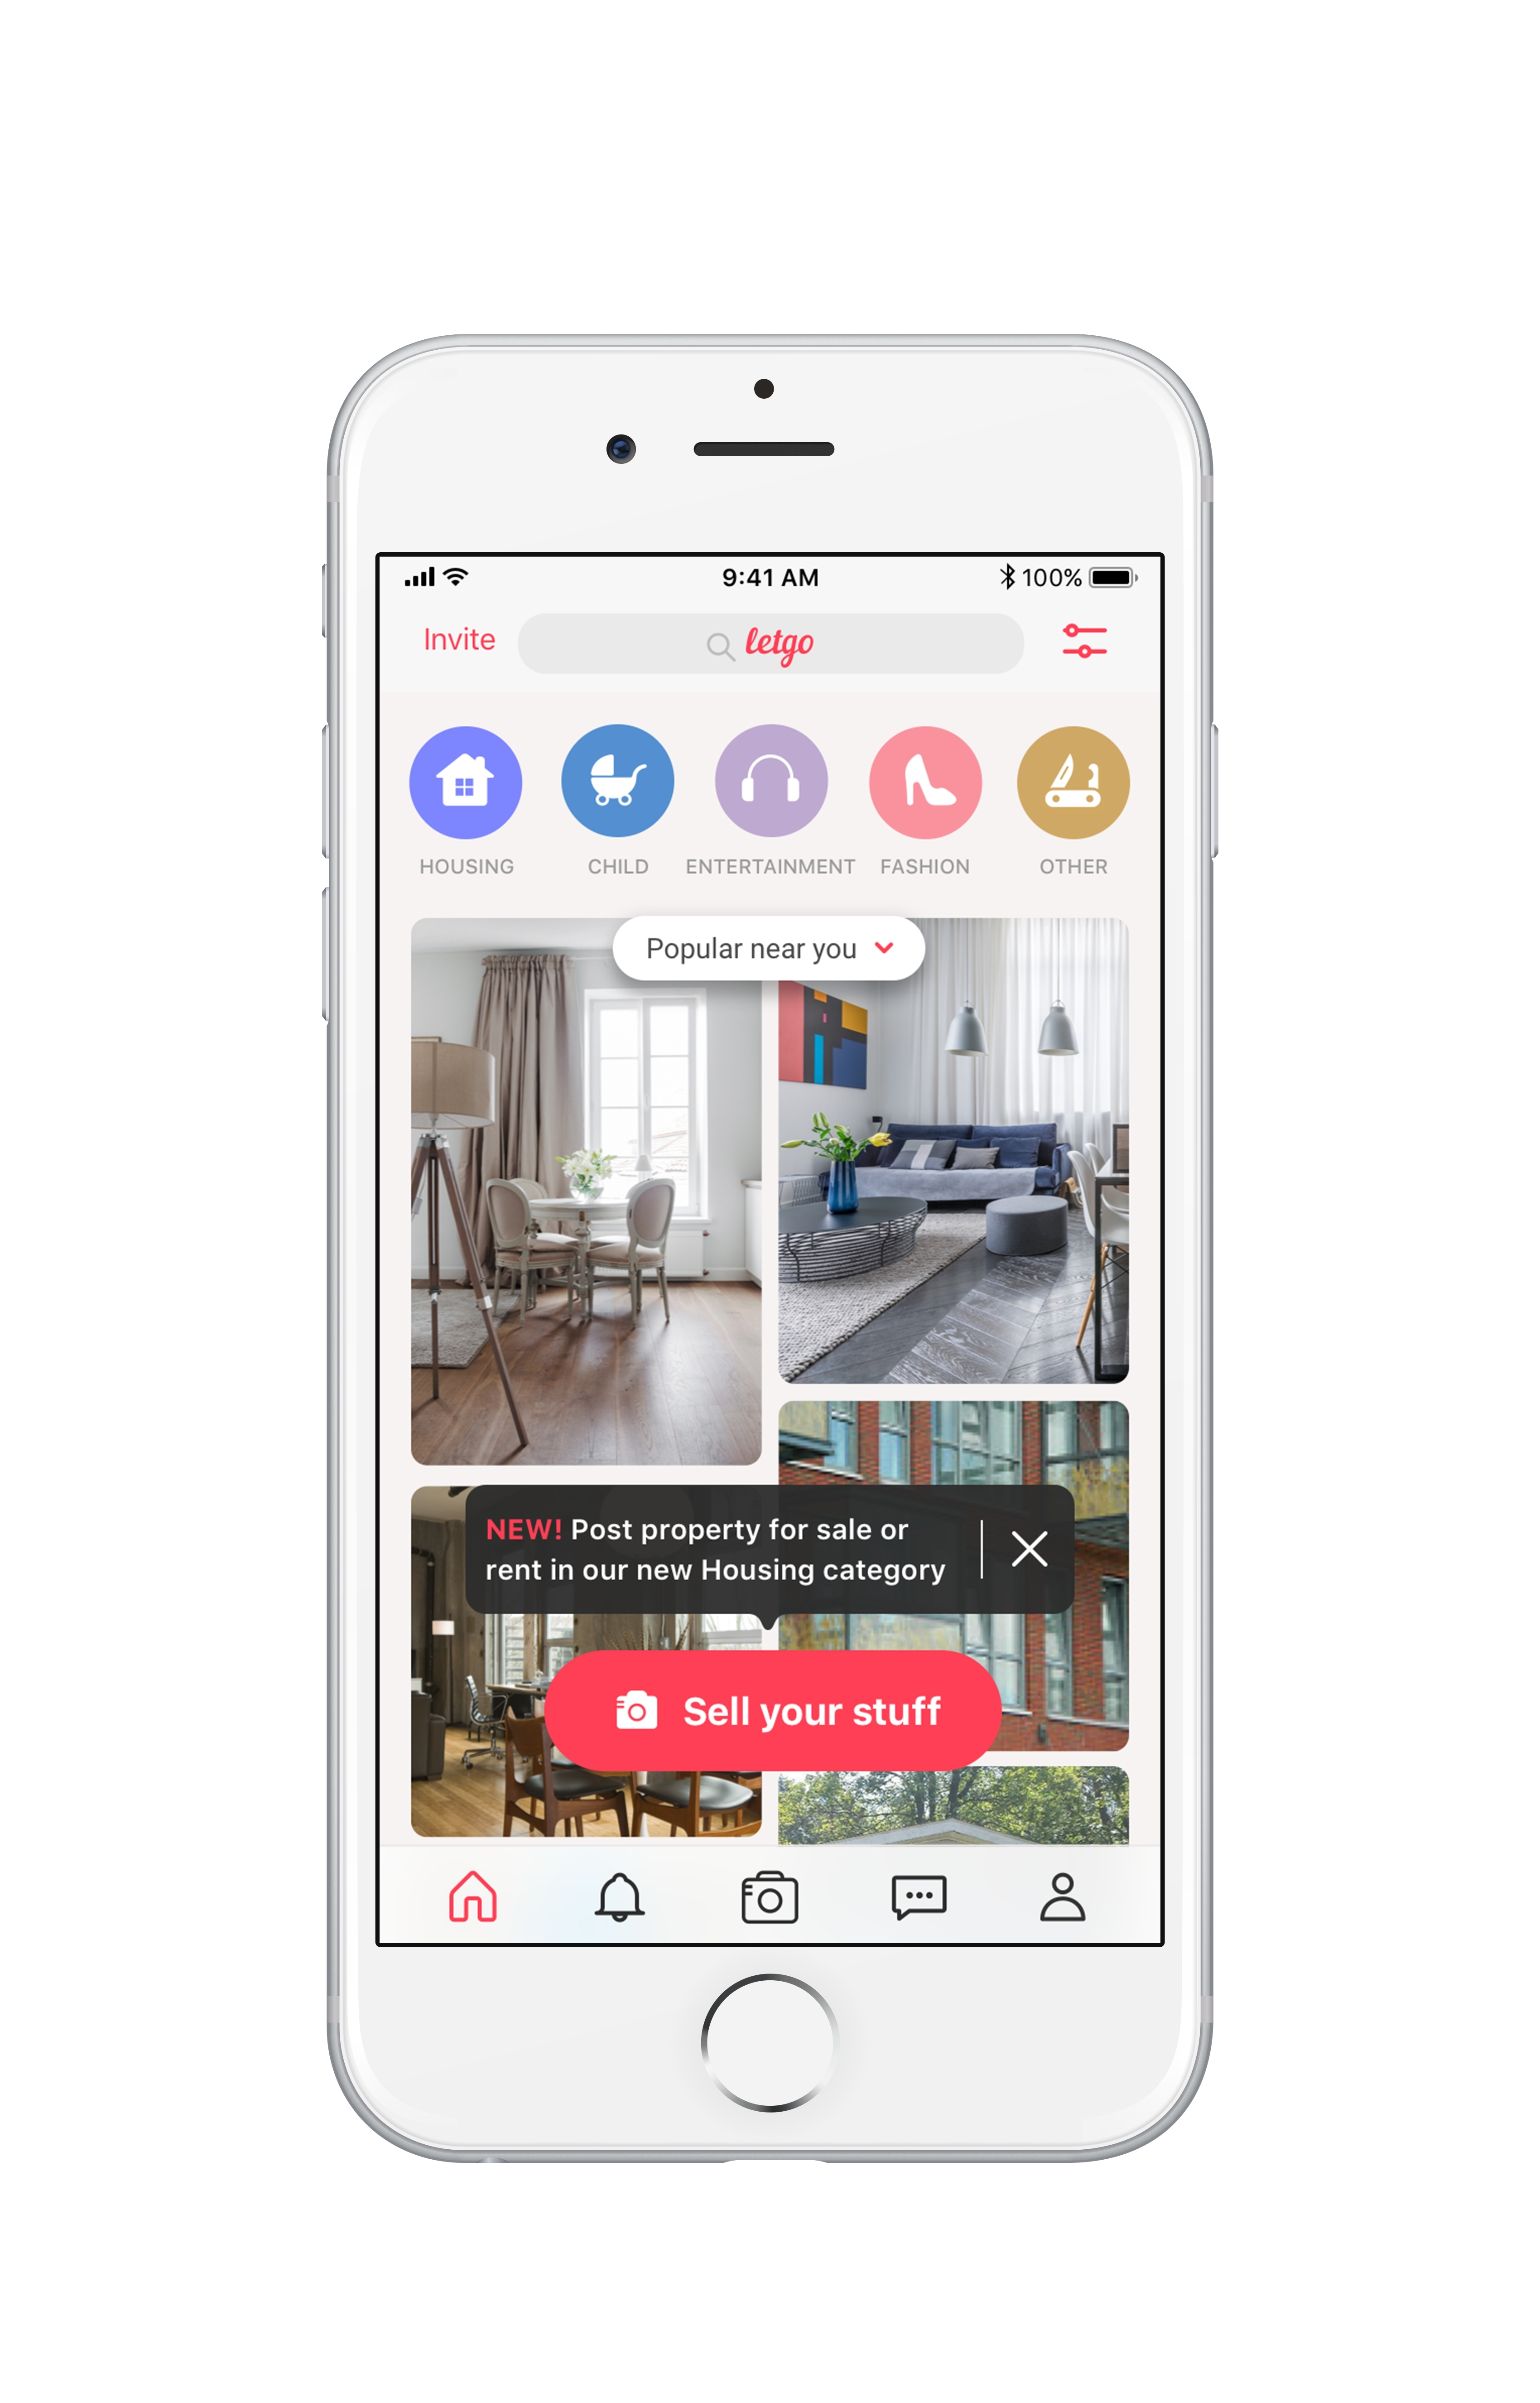 letgo Adds Housing Listings, Expanding Biggest Marketplace